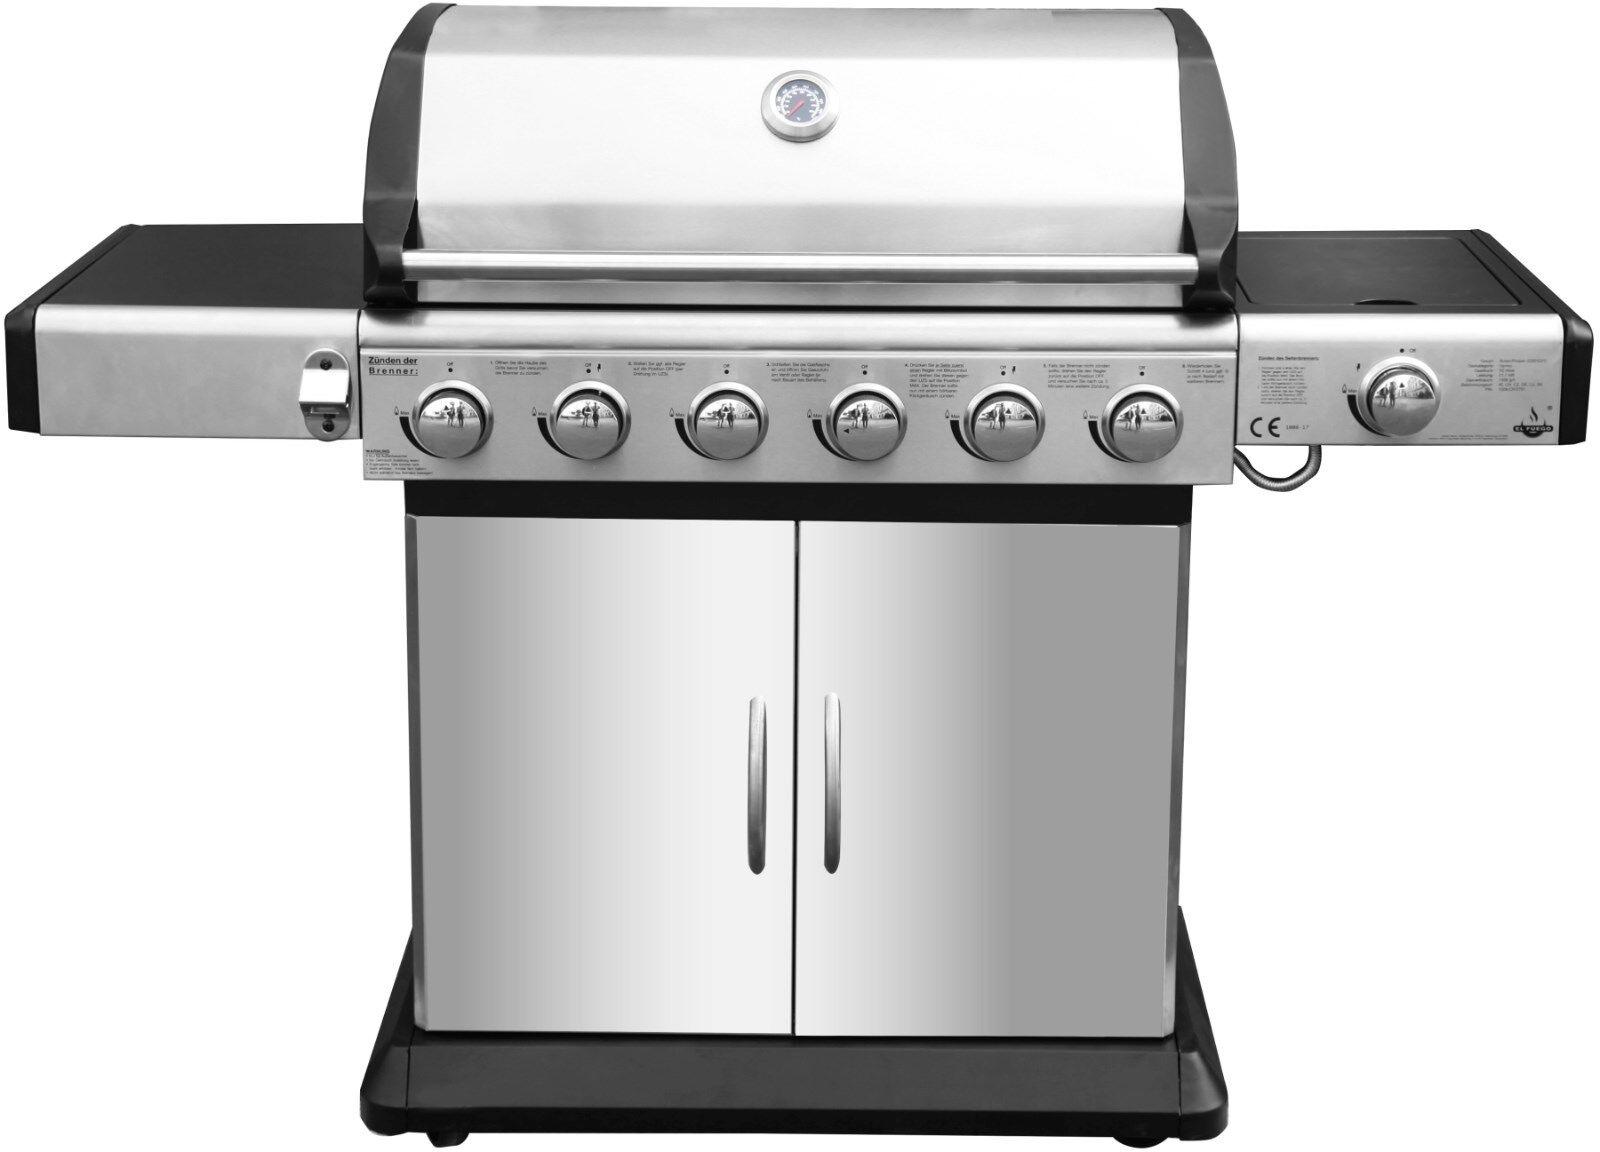 Landmann Gasgrill Neu : Gasgrill bbq brenner grillwagen barbecuegrill